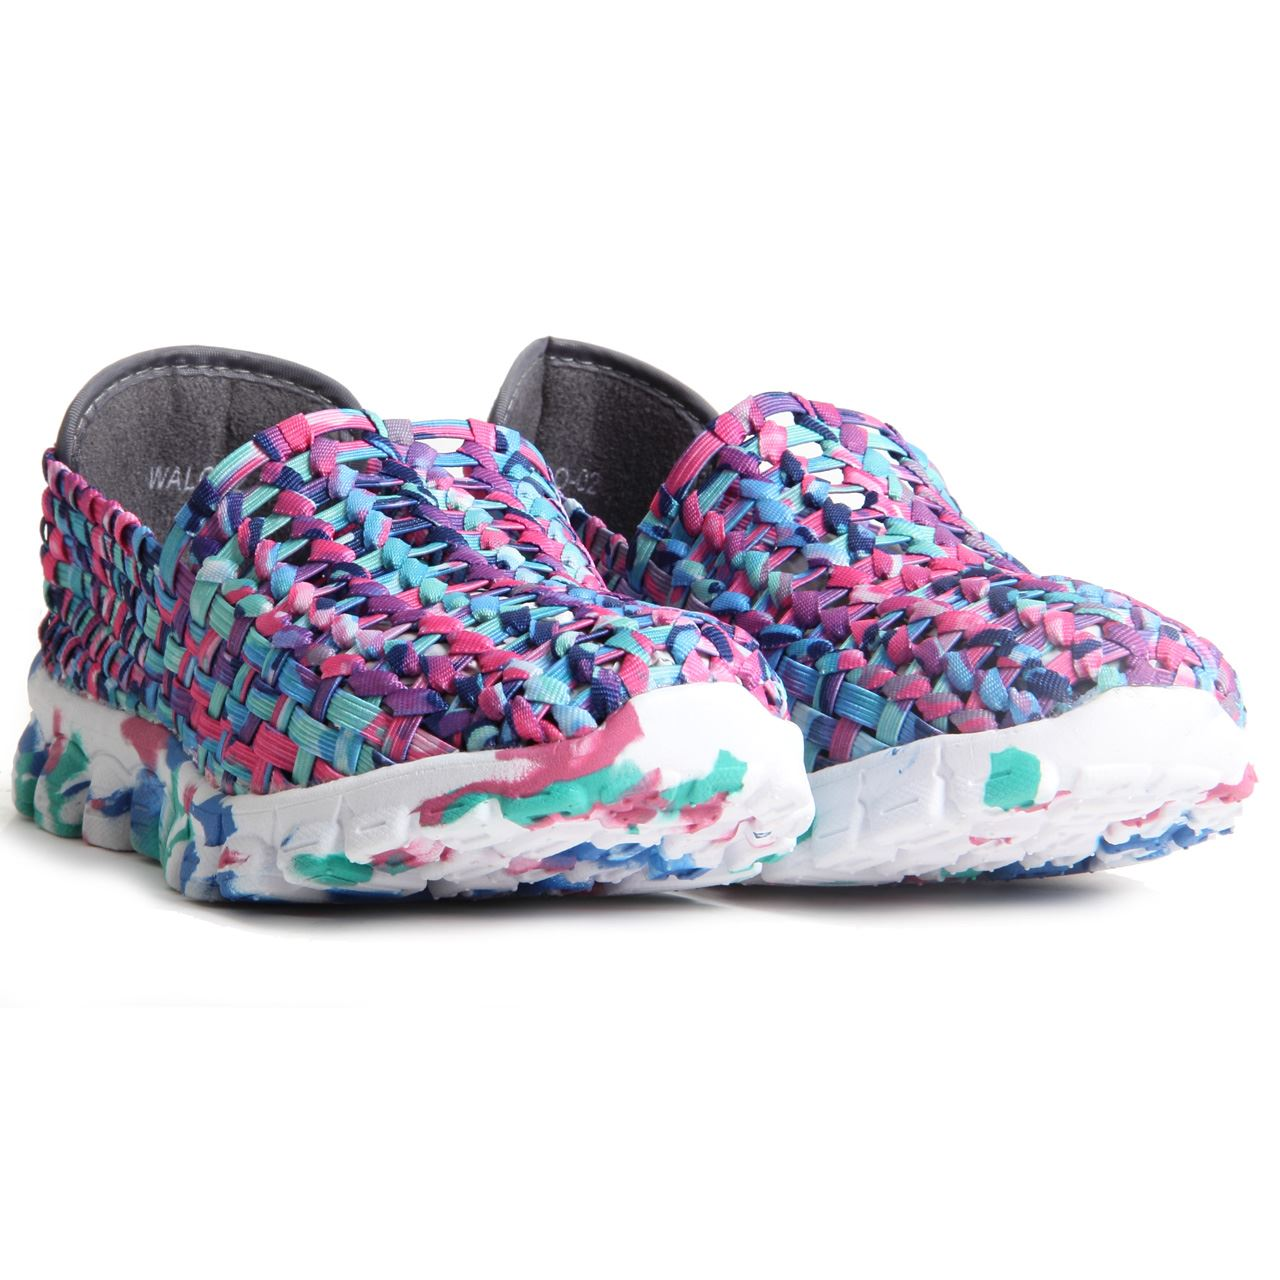 Womens Dc Shoes Amazon